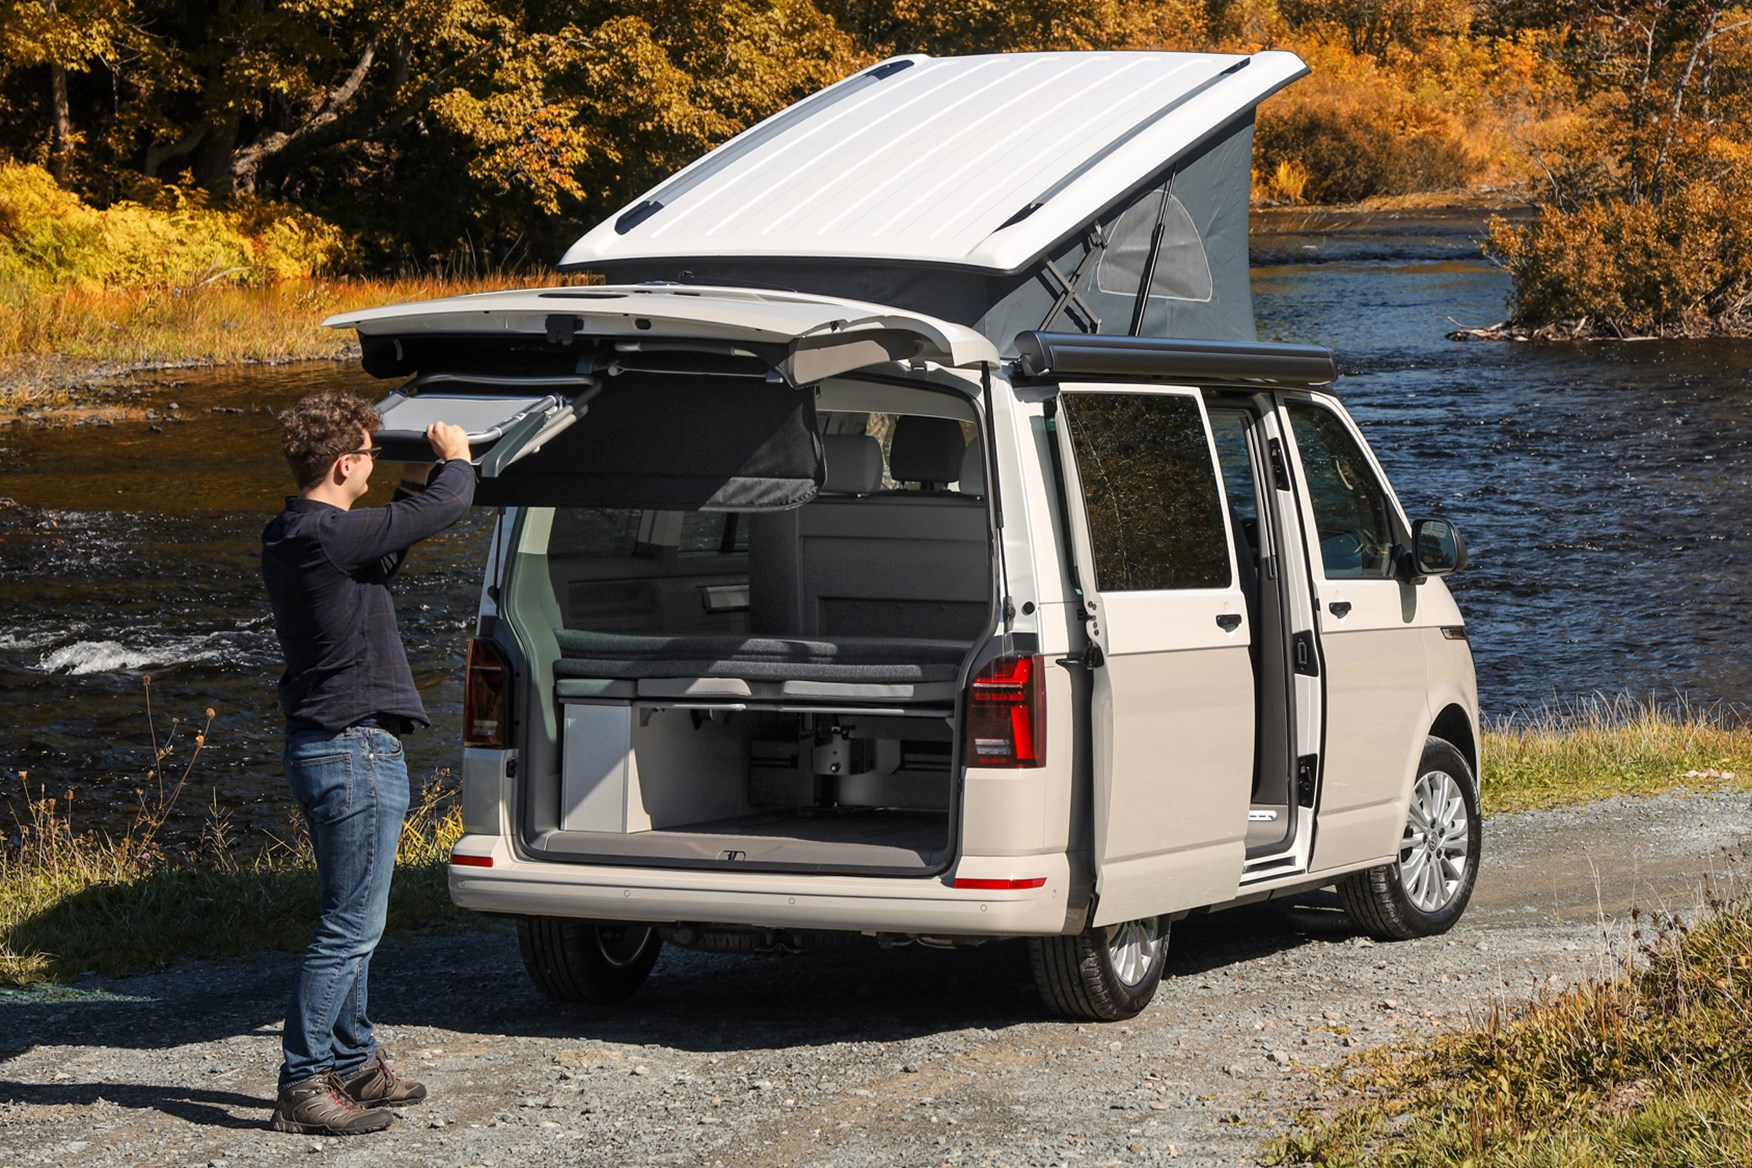 Volkswagen California 6 1 Campervan Full Details On Car Car Magazine